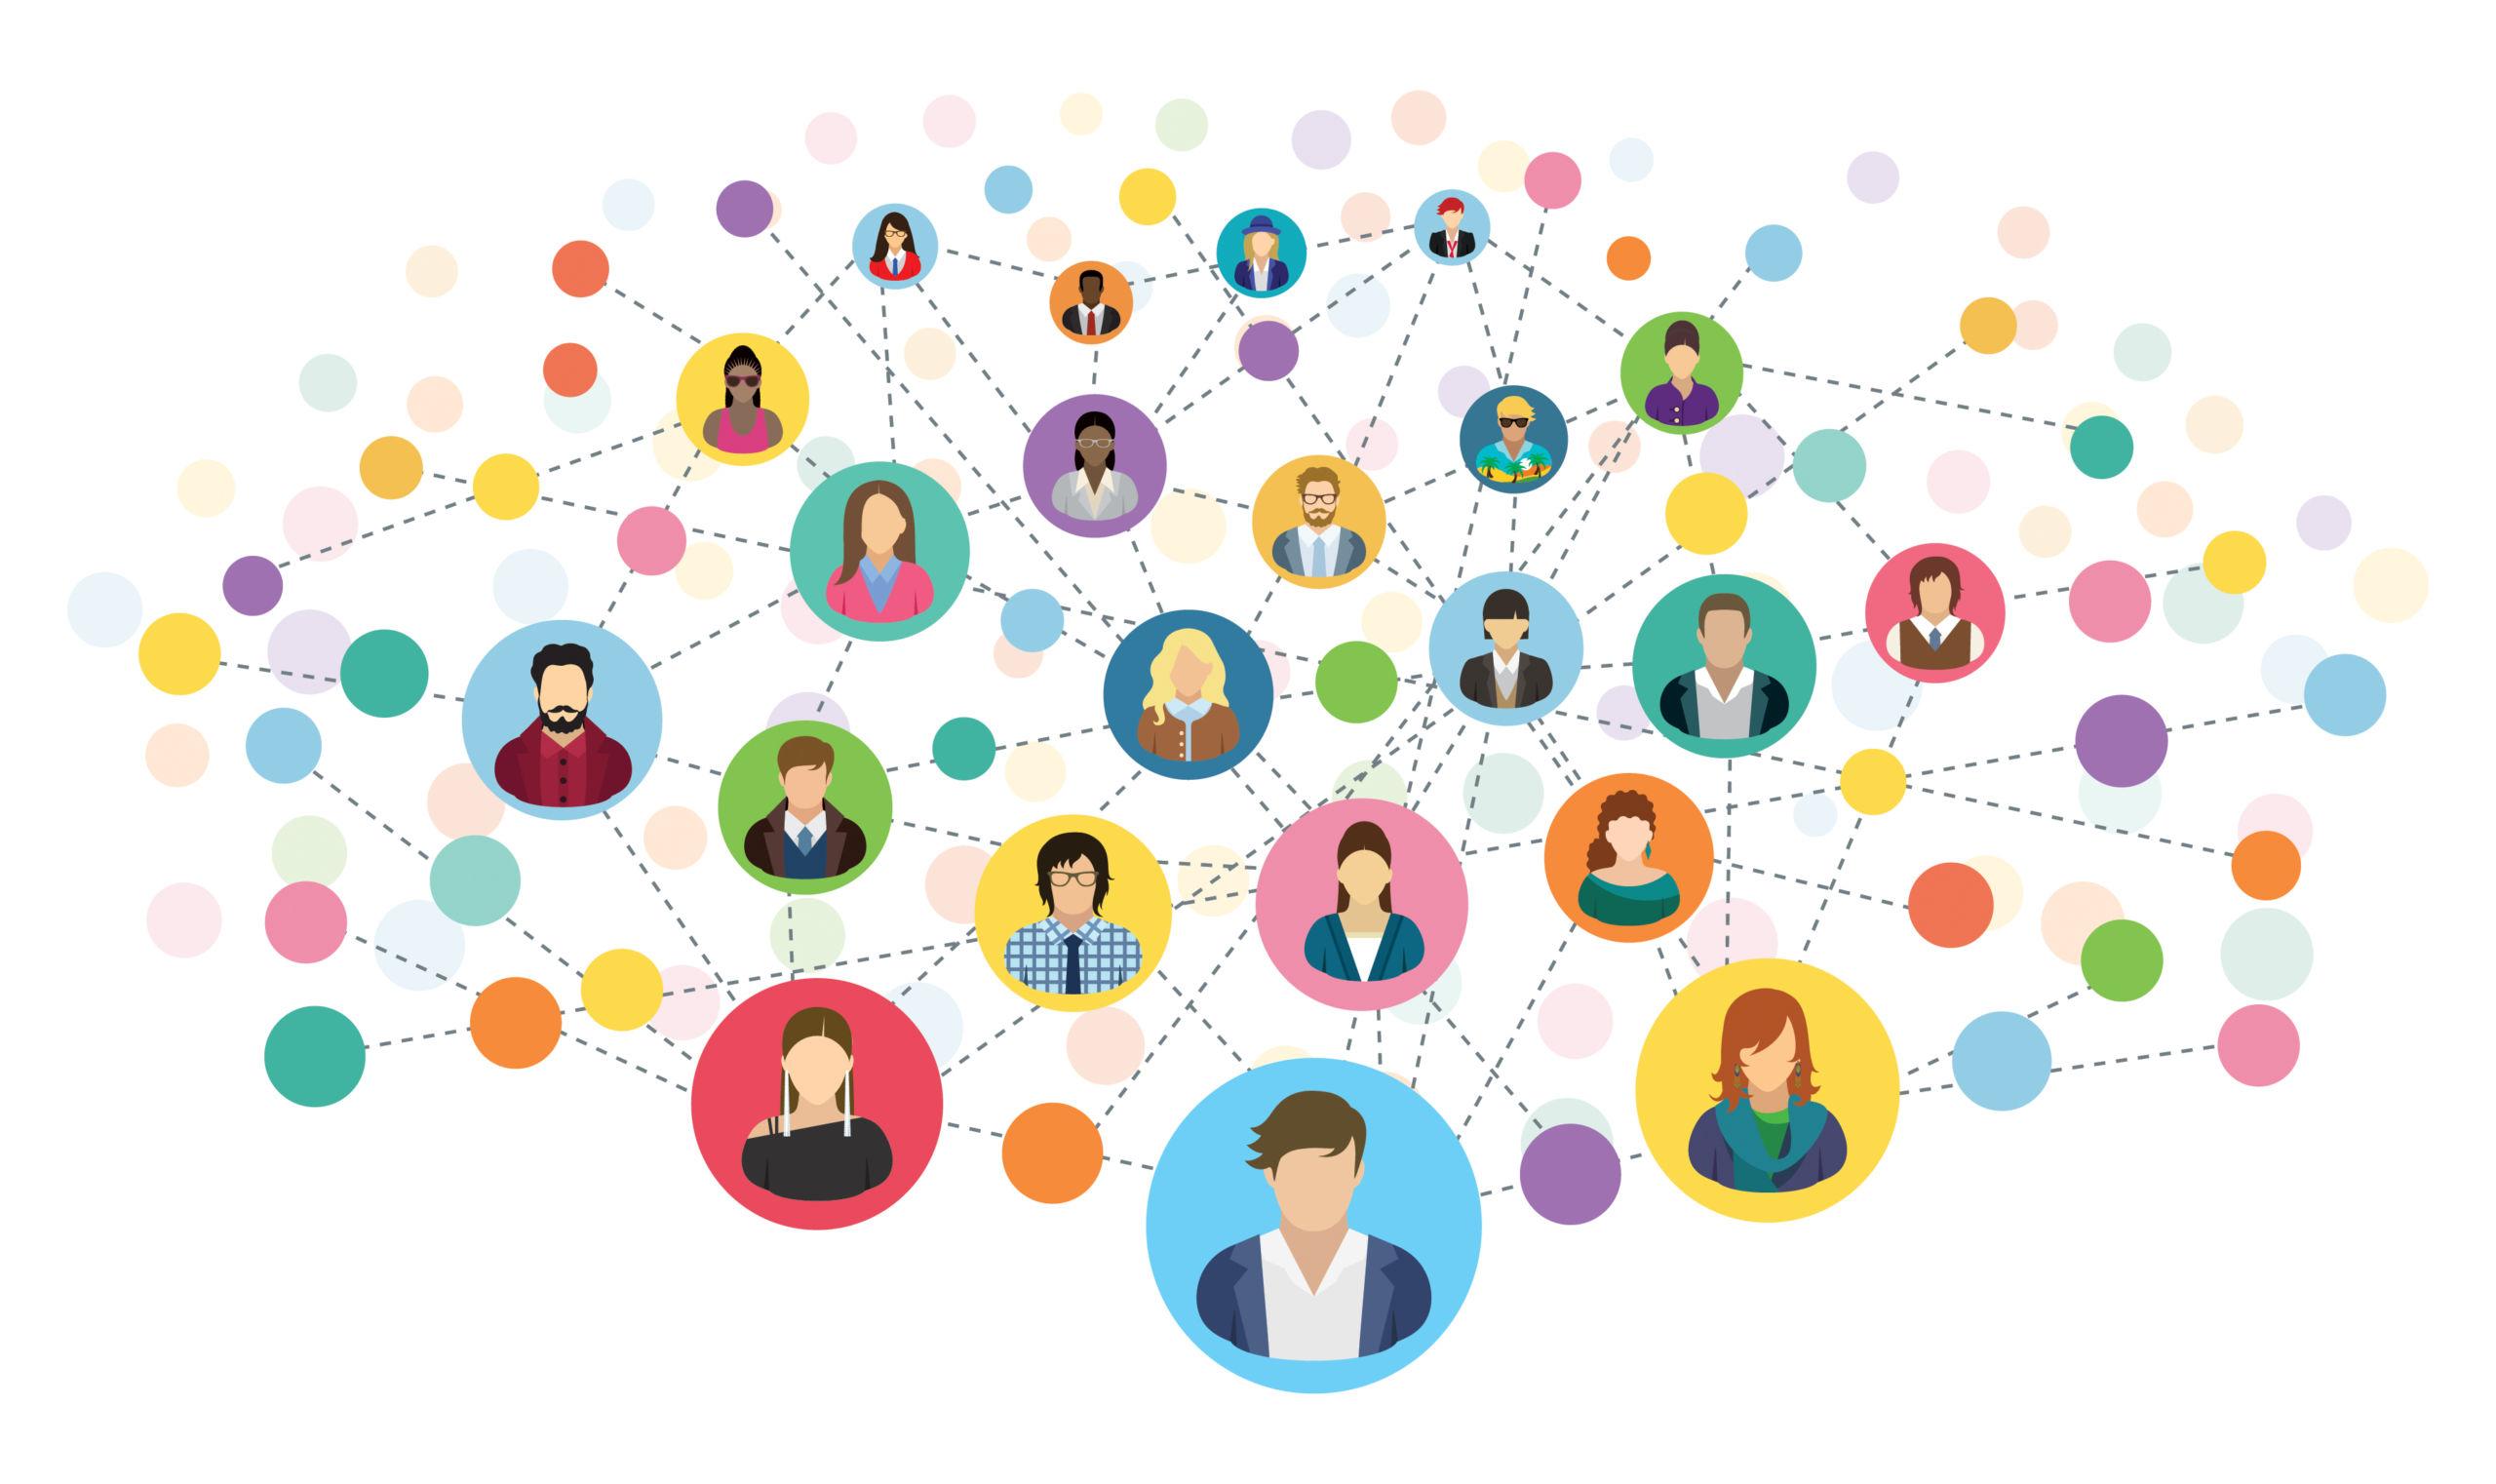 influencer marketing, indidigital, Influencer marketing Instagram, Social media influencer marketing, Top social media influencer, Top influencer marketing agency, Influencer marketing agency for small business, influencer marketing agency services, influencer marketing company in india, Influencer in India, Celebrity influencers India, Digital influencers in India